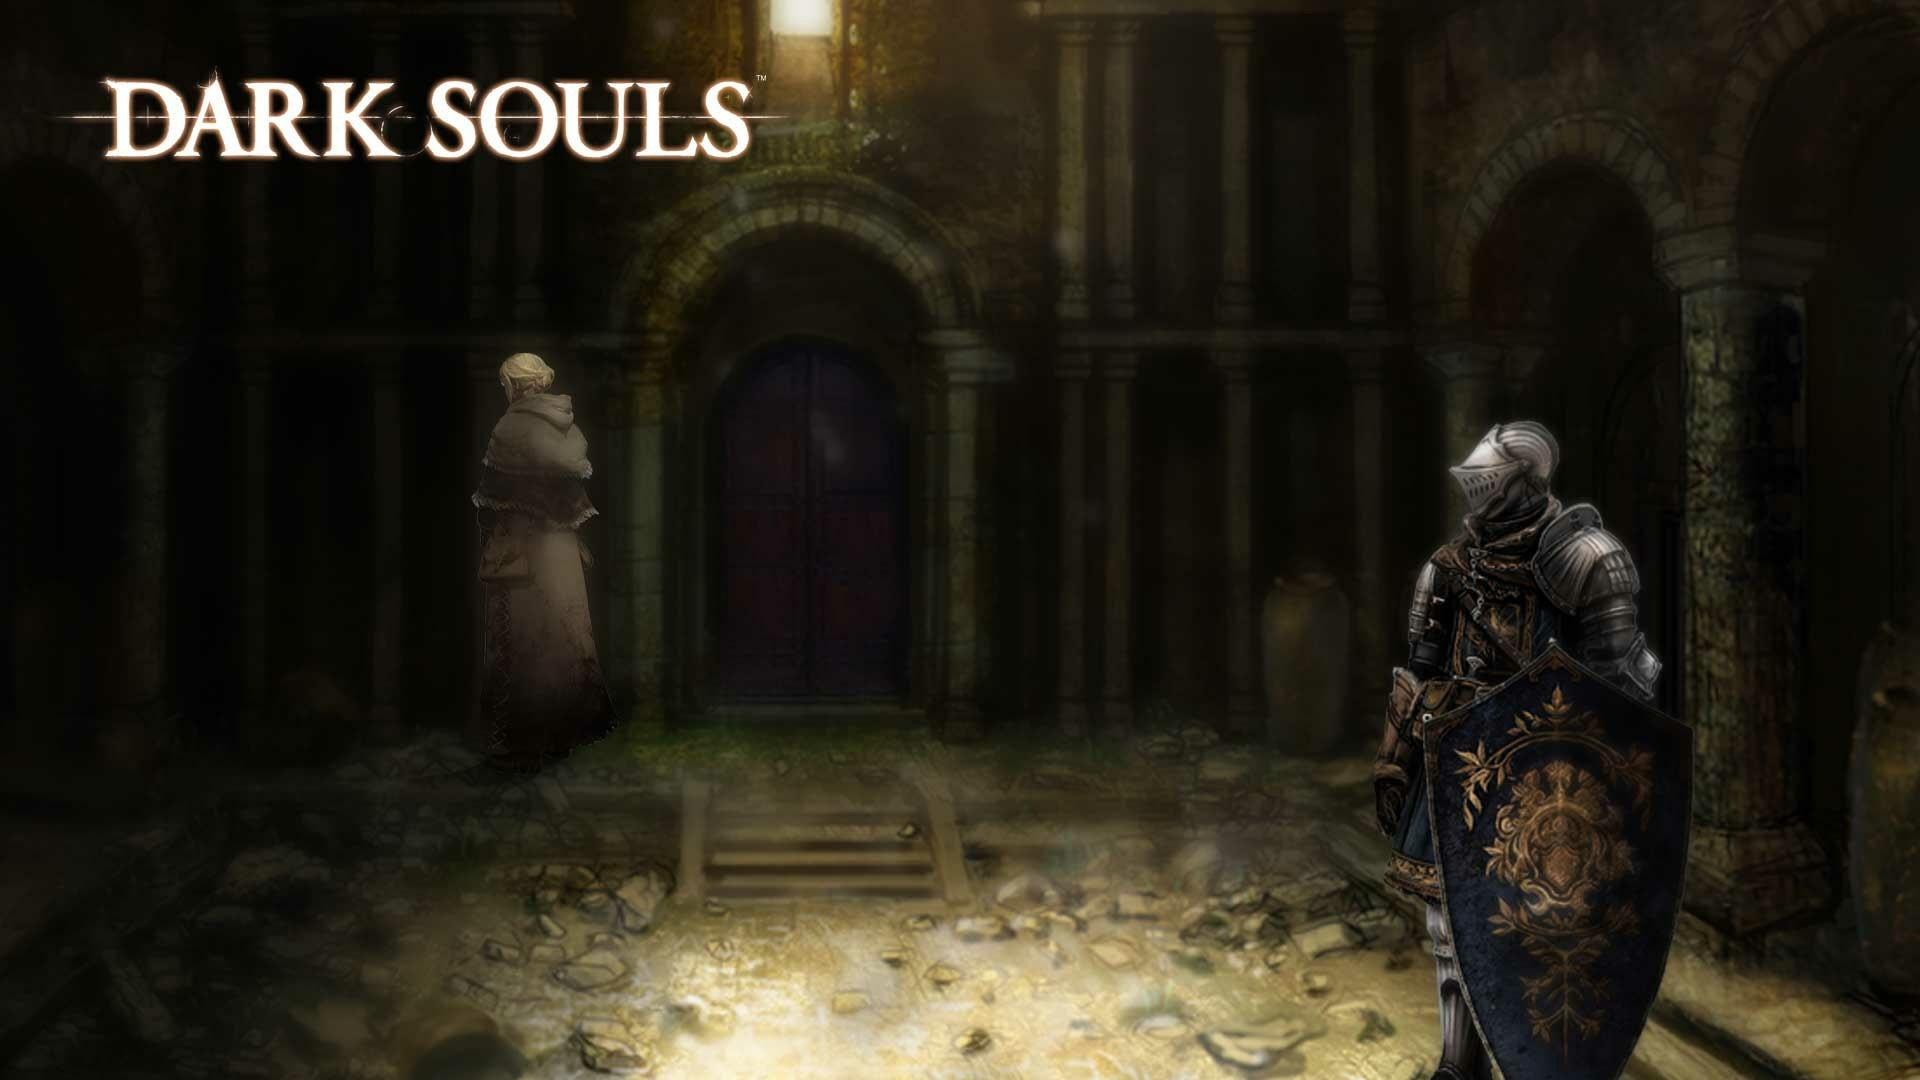 Amazing Dark Souls Knight Shield Helmet Armor Wallpaper Â« Kuff Games